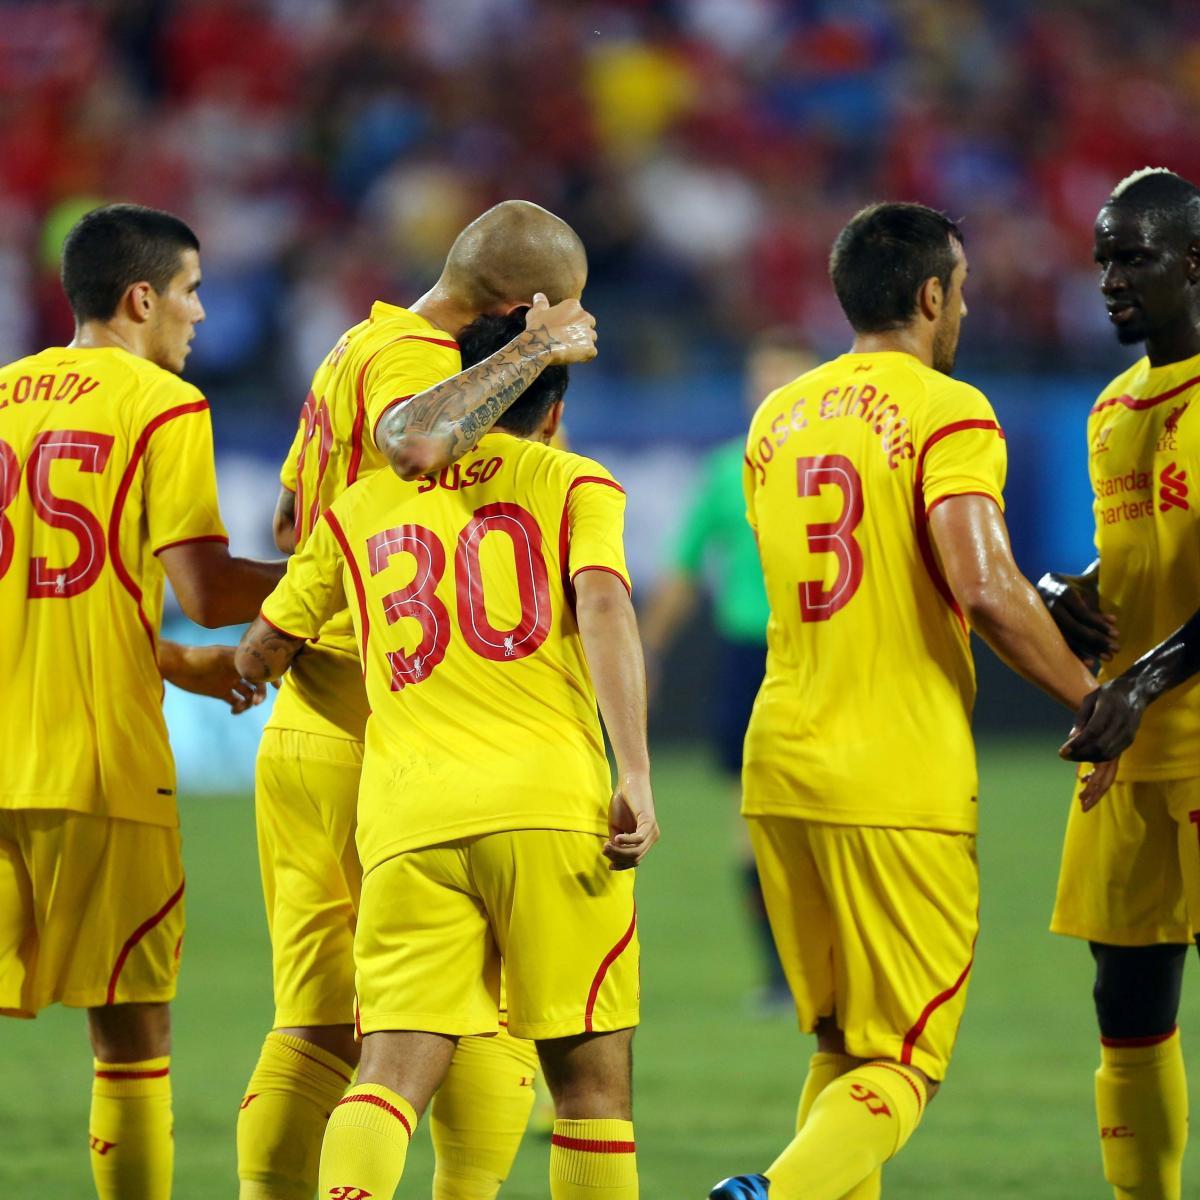 Liverpool Fc 4 0 Barcelona International Champions Cup: International Champions Cup Final: How Liverpool Will Line